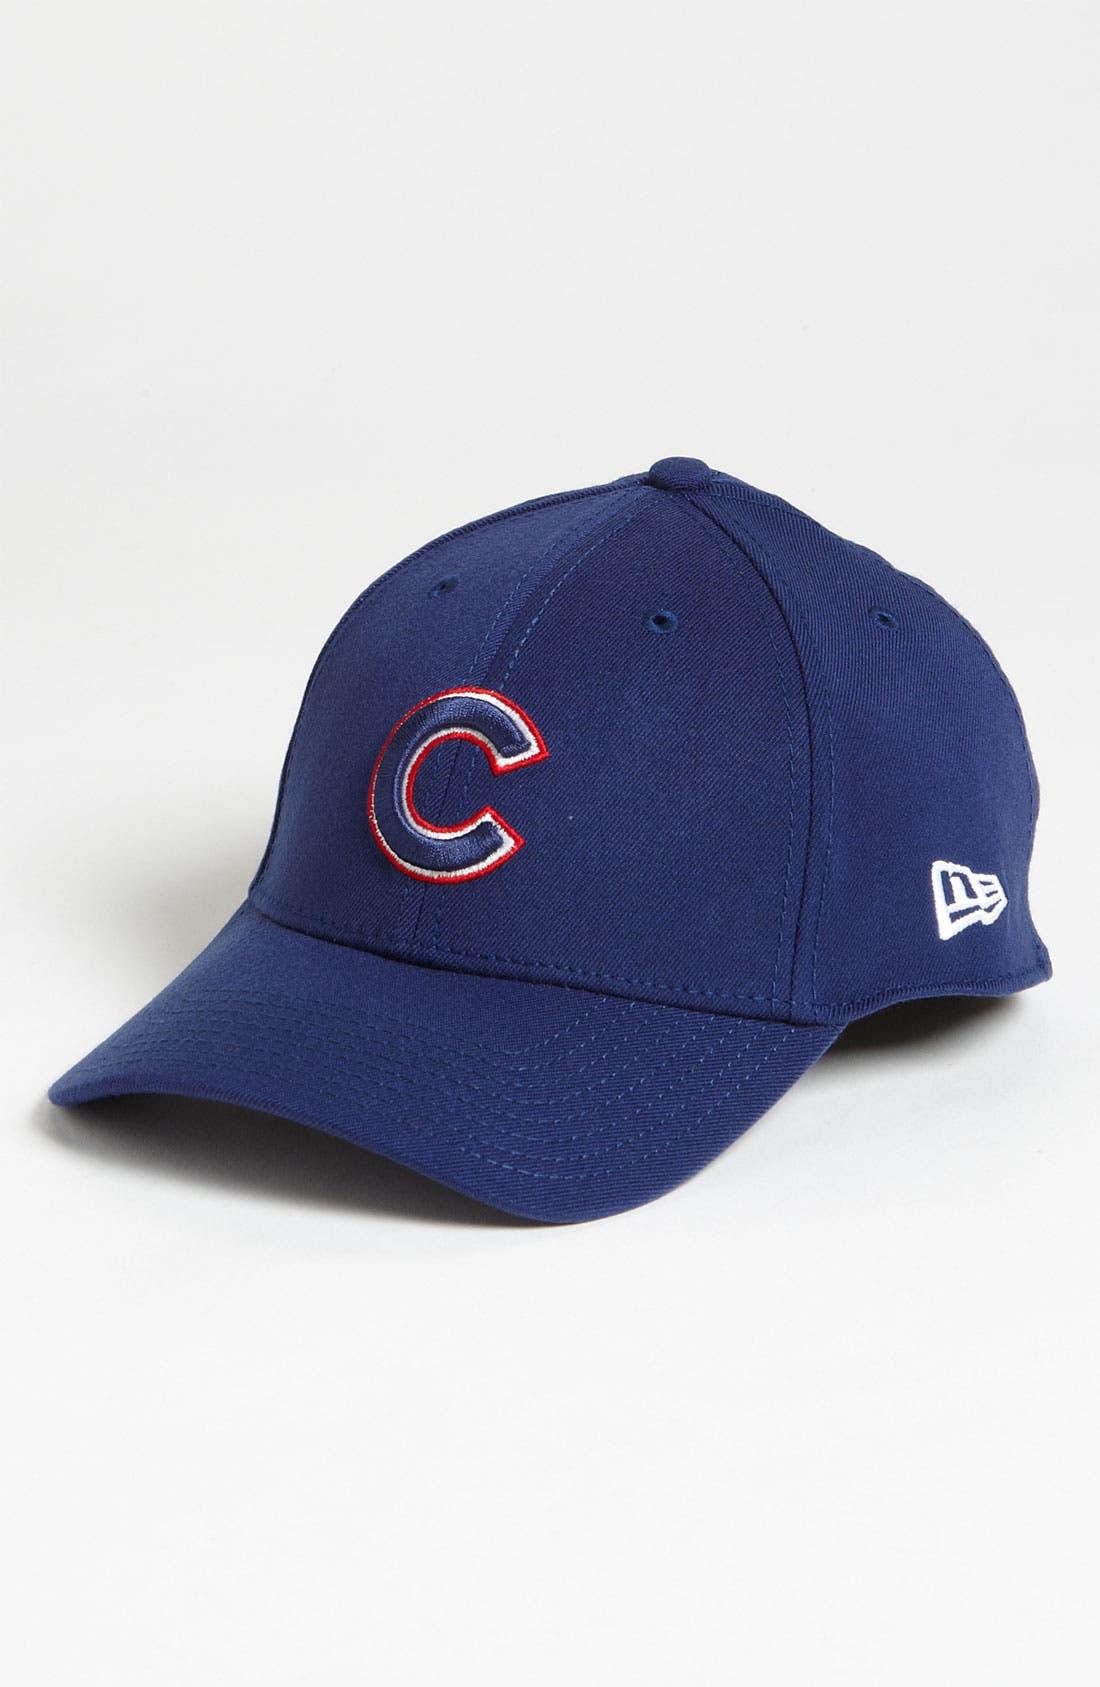 Alternate Image 1 Selected - New Era Cap 'Chicago Cubs' Baseball Cap